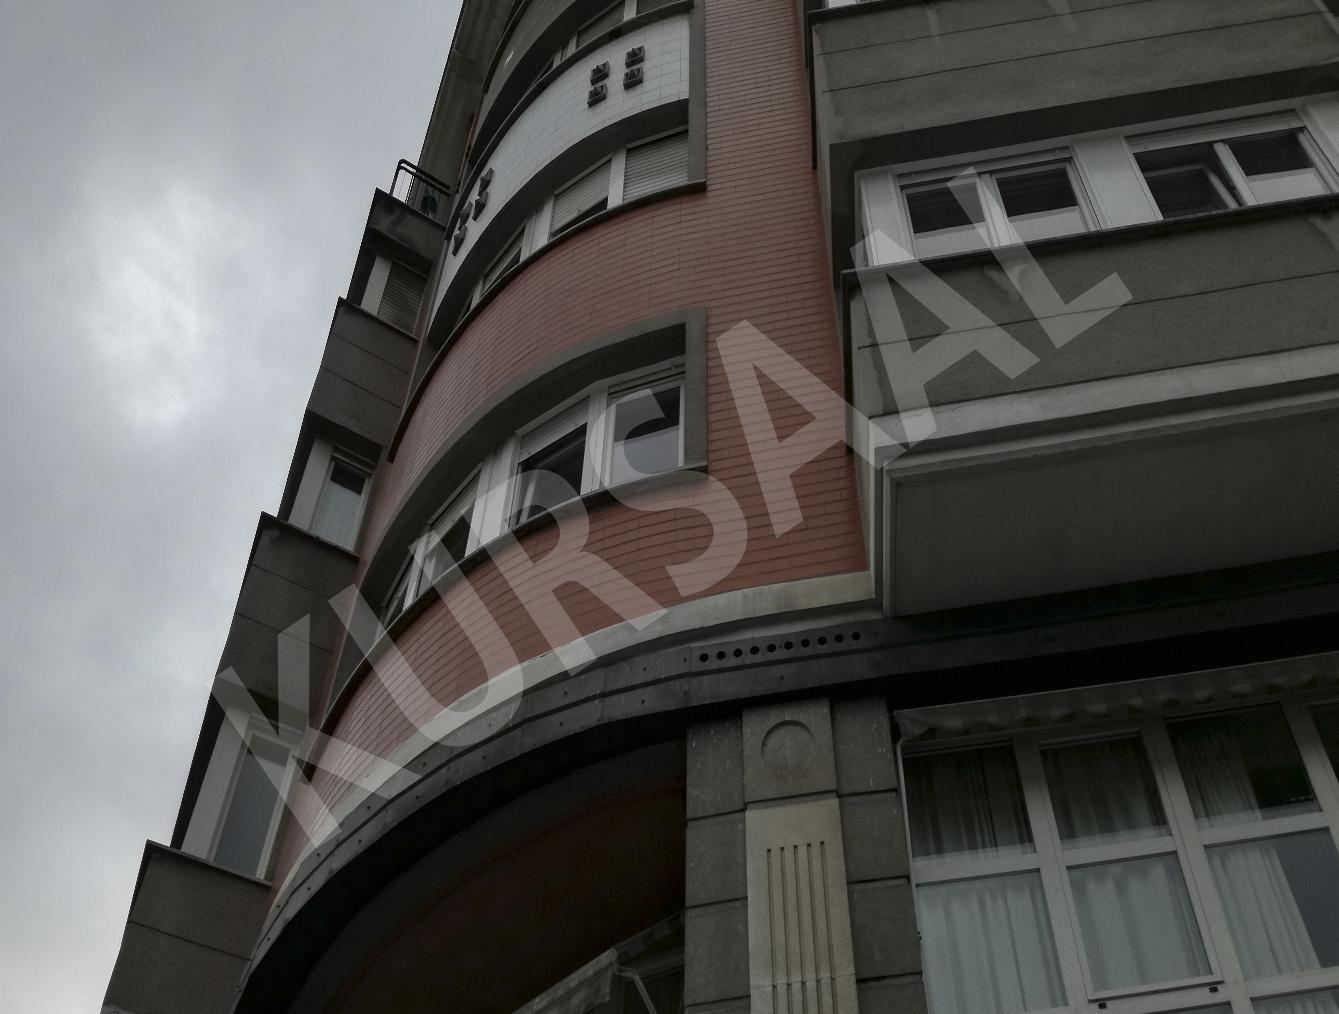 foto 7 - Restauración y patrimonio-Marcelino Soroa 5-DONOSTIA, GIPUZKOA